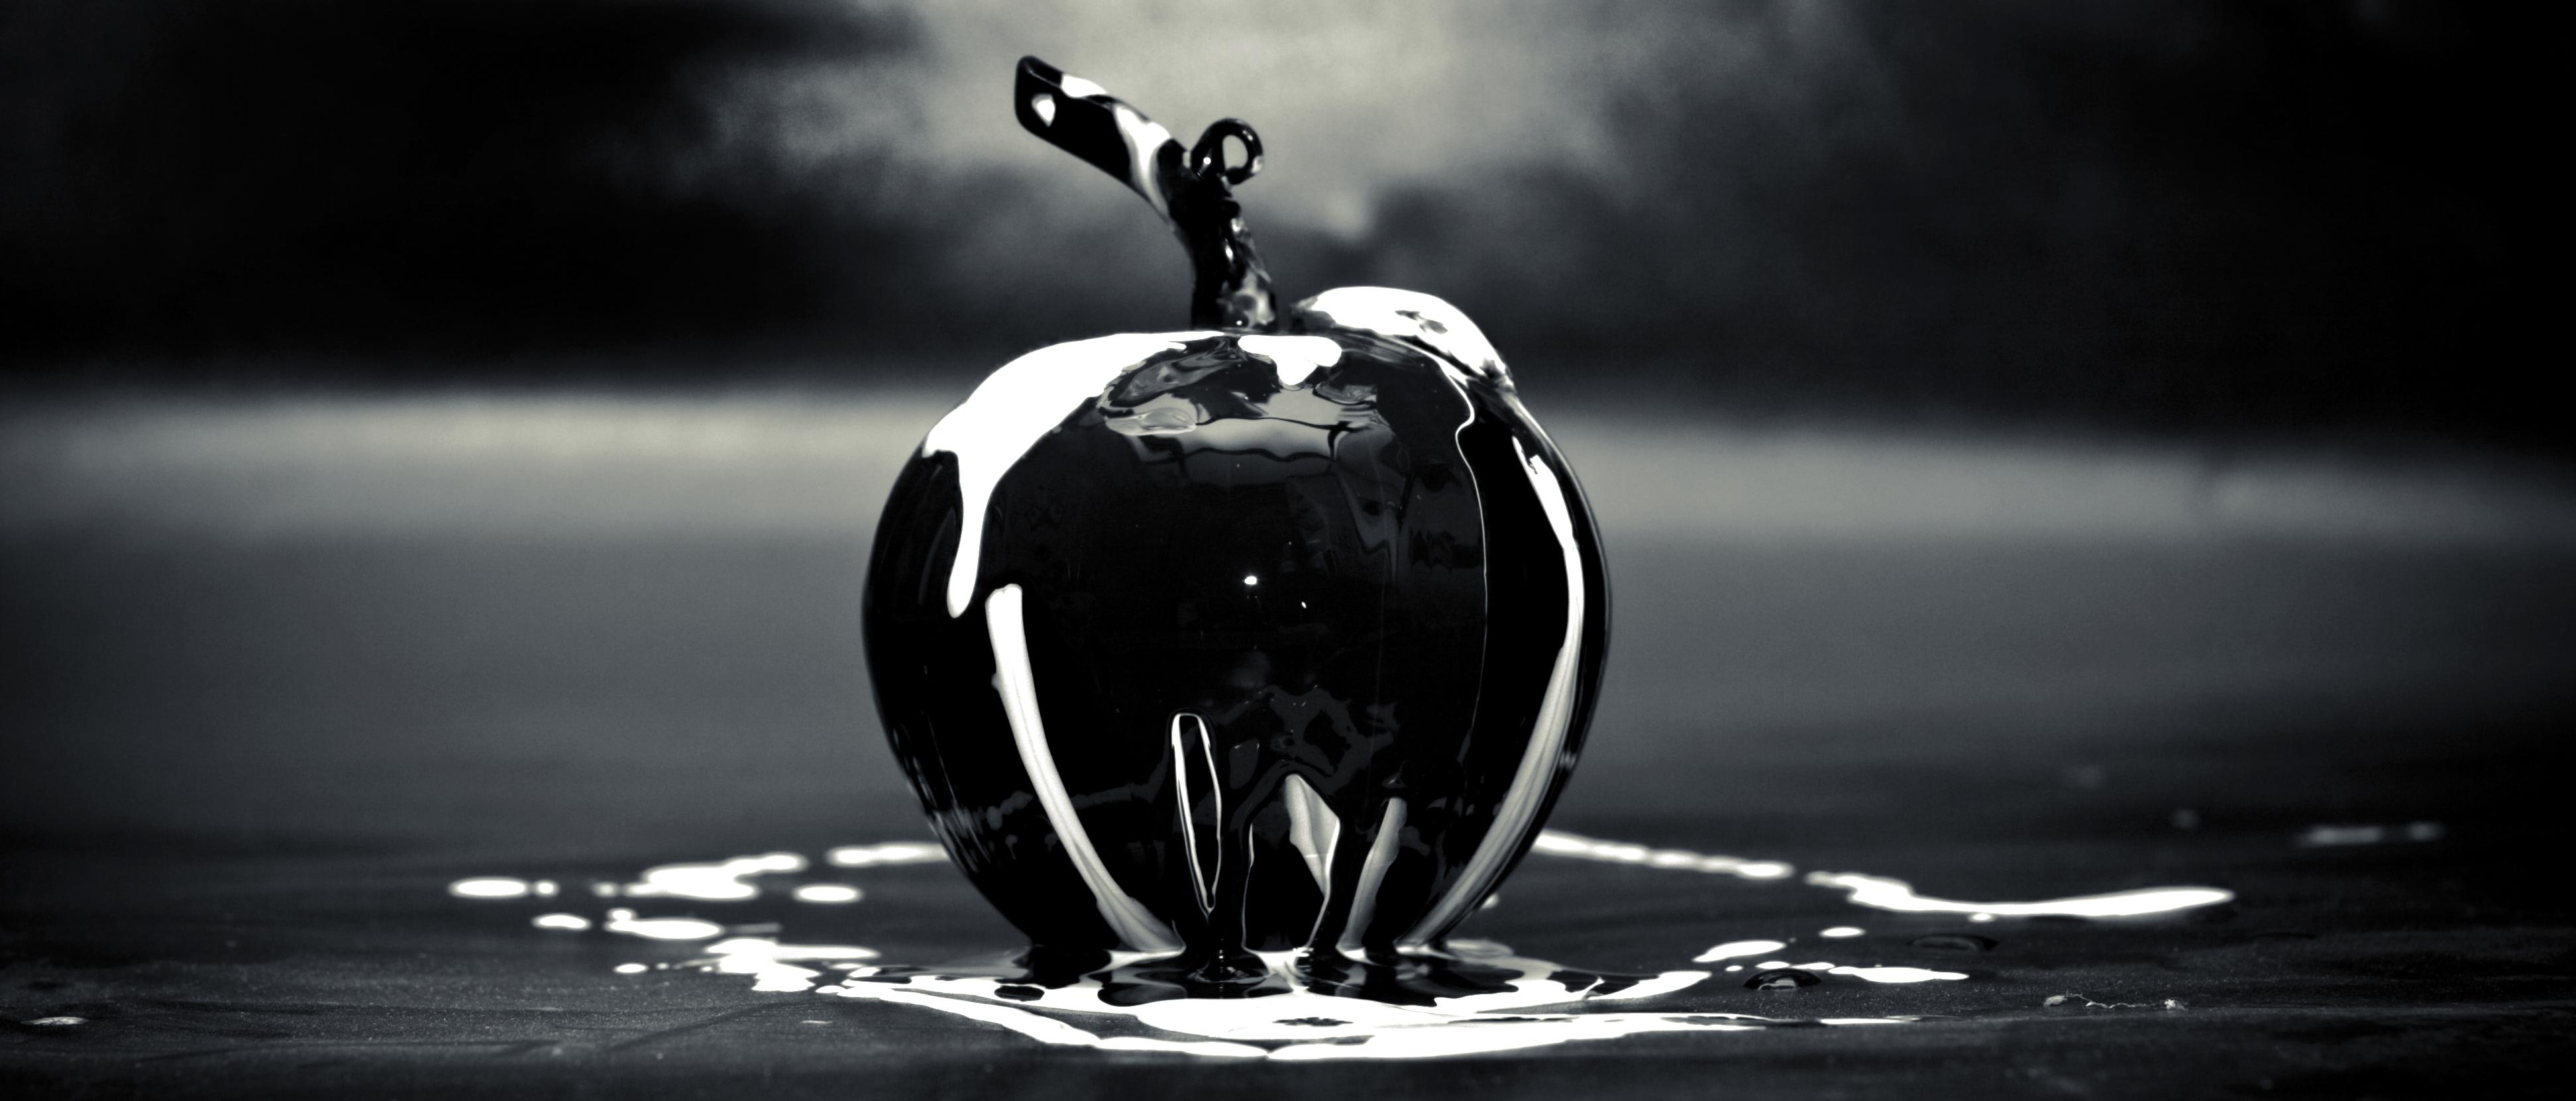 free stock photo of apple art black. Black Bedroom Furniture Sets. Home Design Ideas